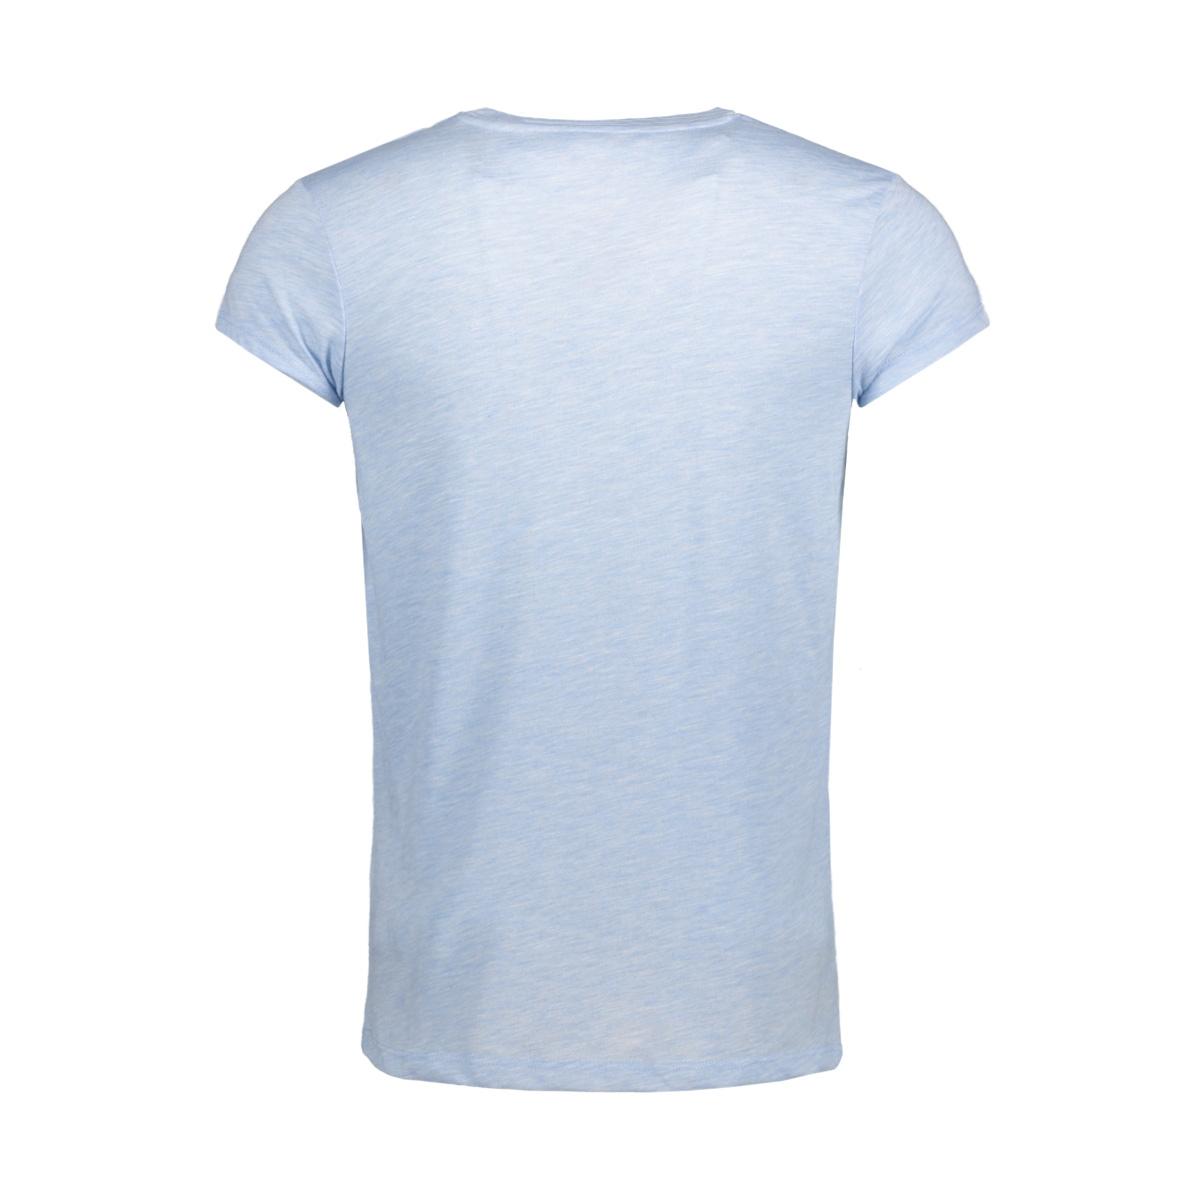 jprmust tee ss v neck exp 12130936 jack & jones t-shirt chambray blue/slim fit